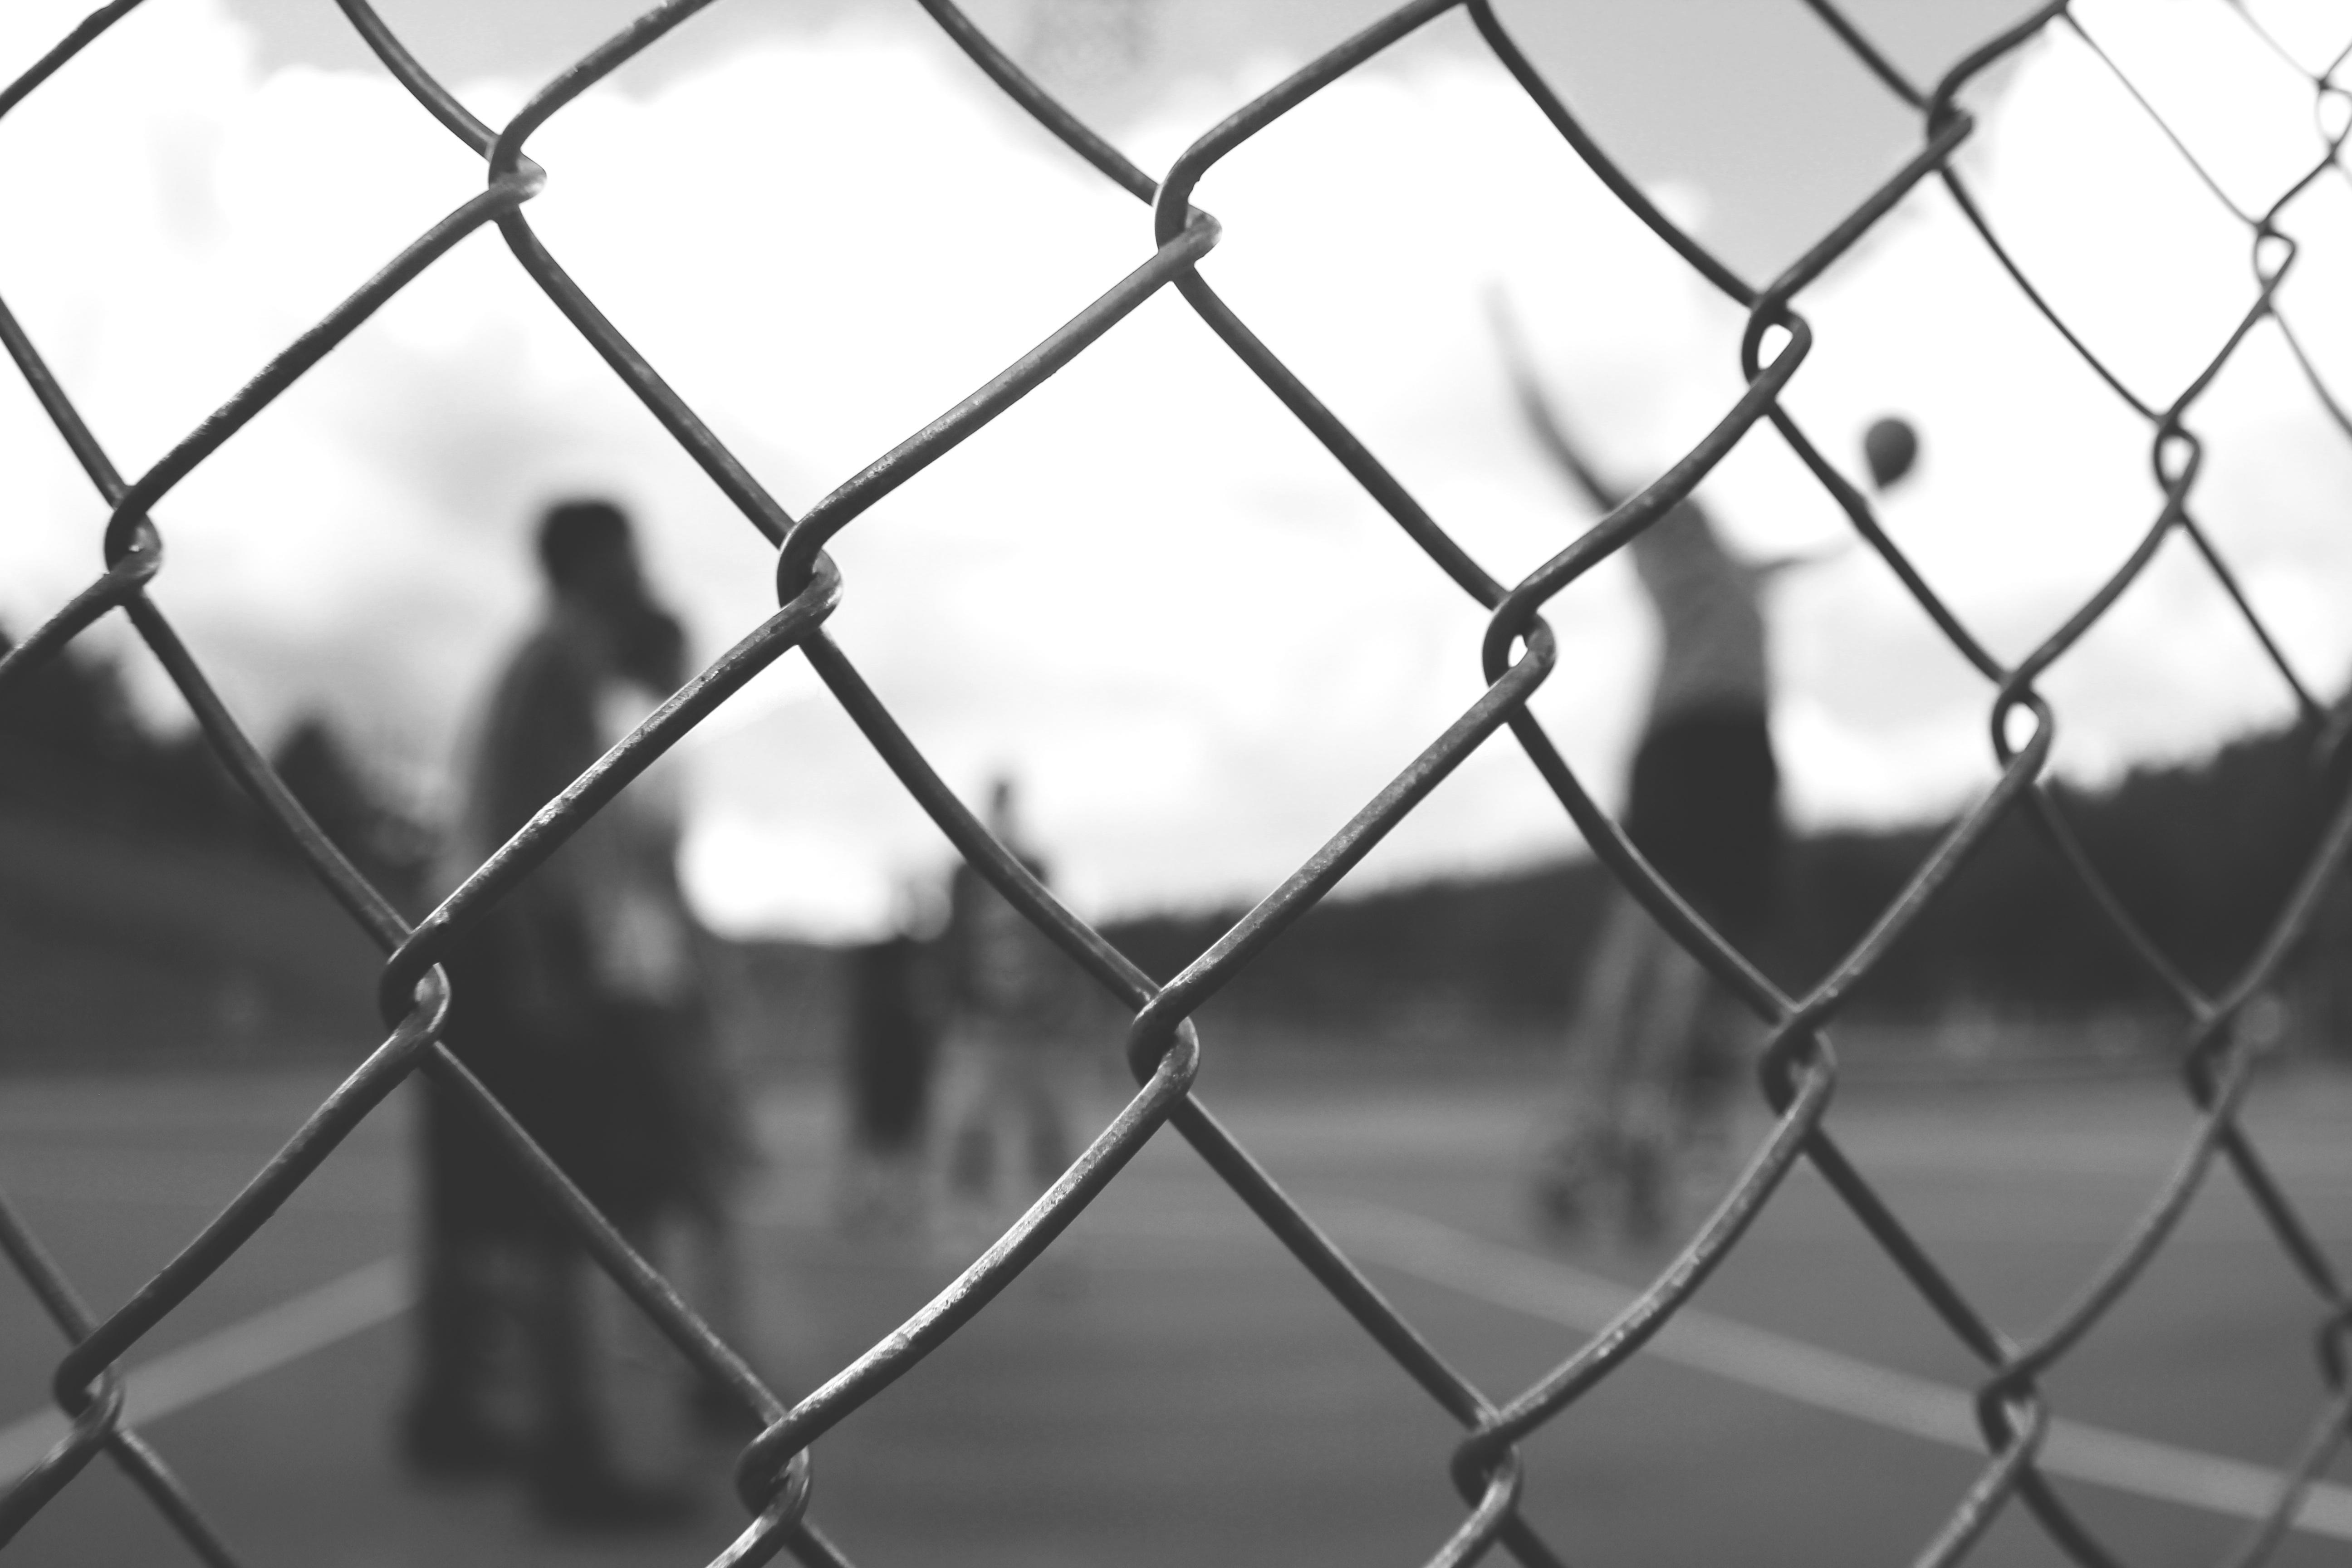 Dipendenza da sport o overtraining?